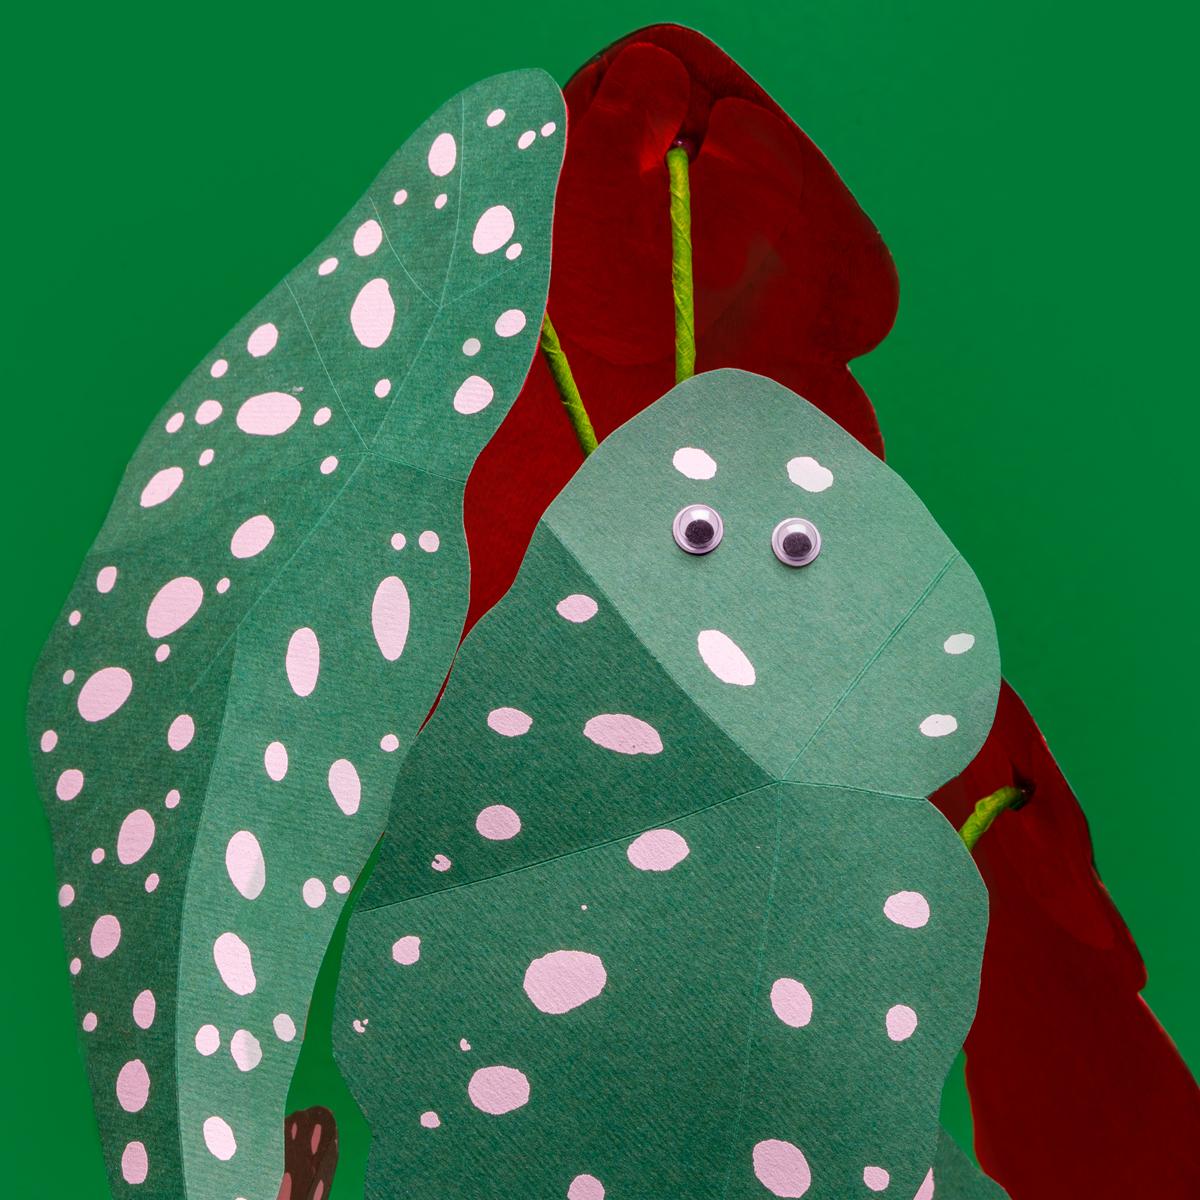 Jungla, plantas de papel polka dot ojos